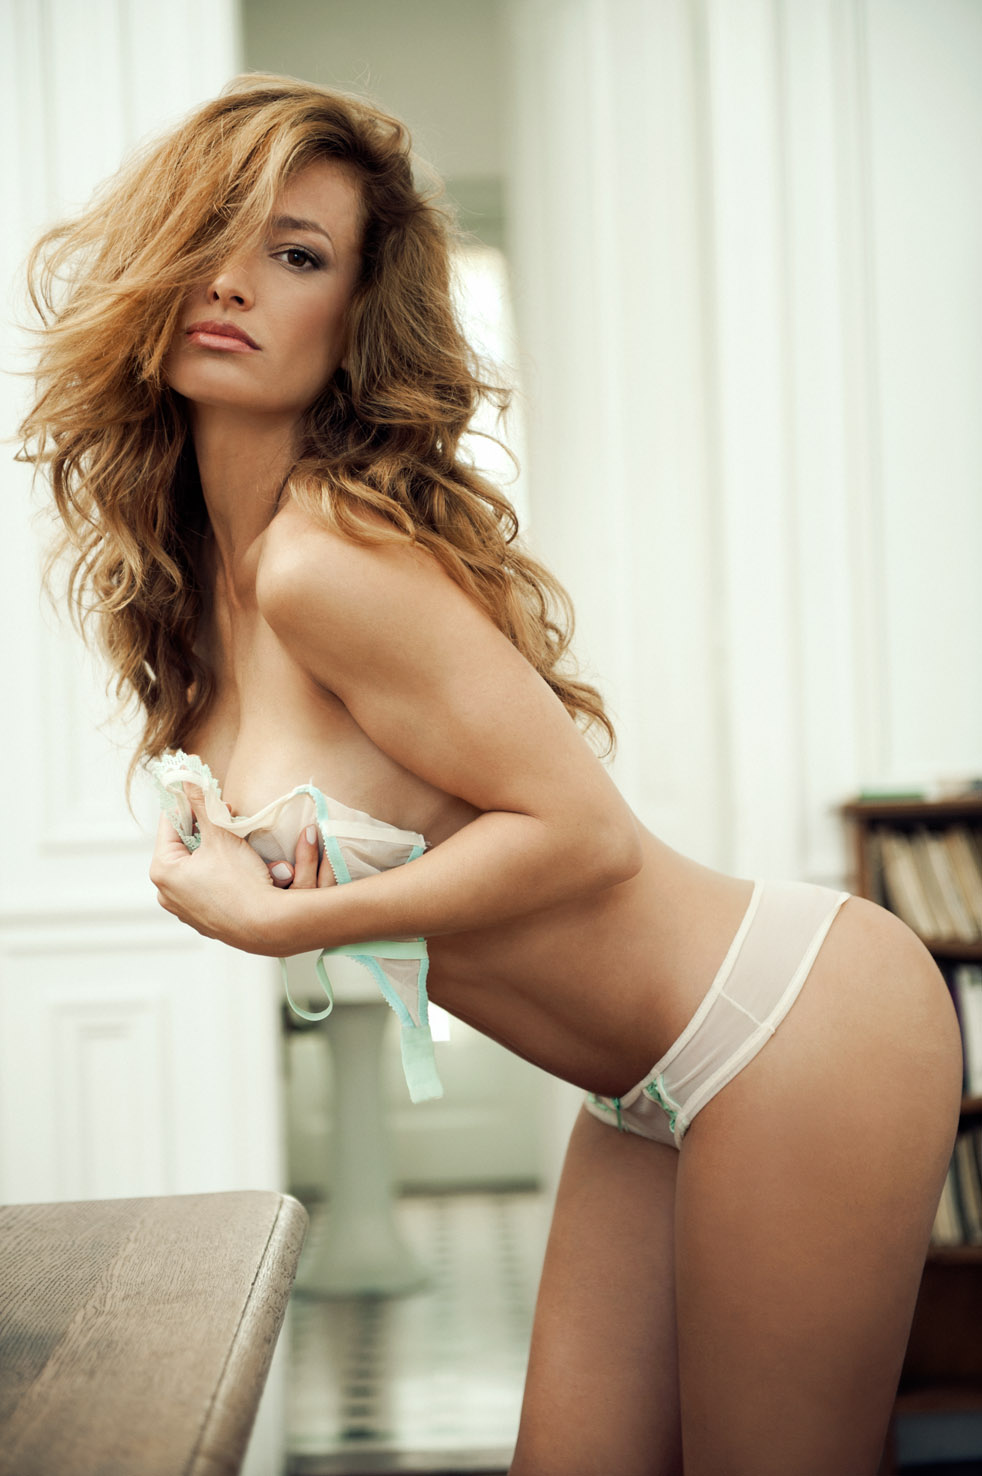 Shemale lesbian sex slave porn